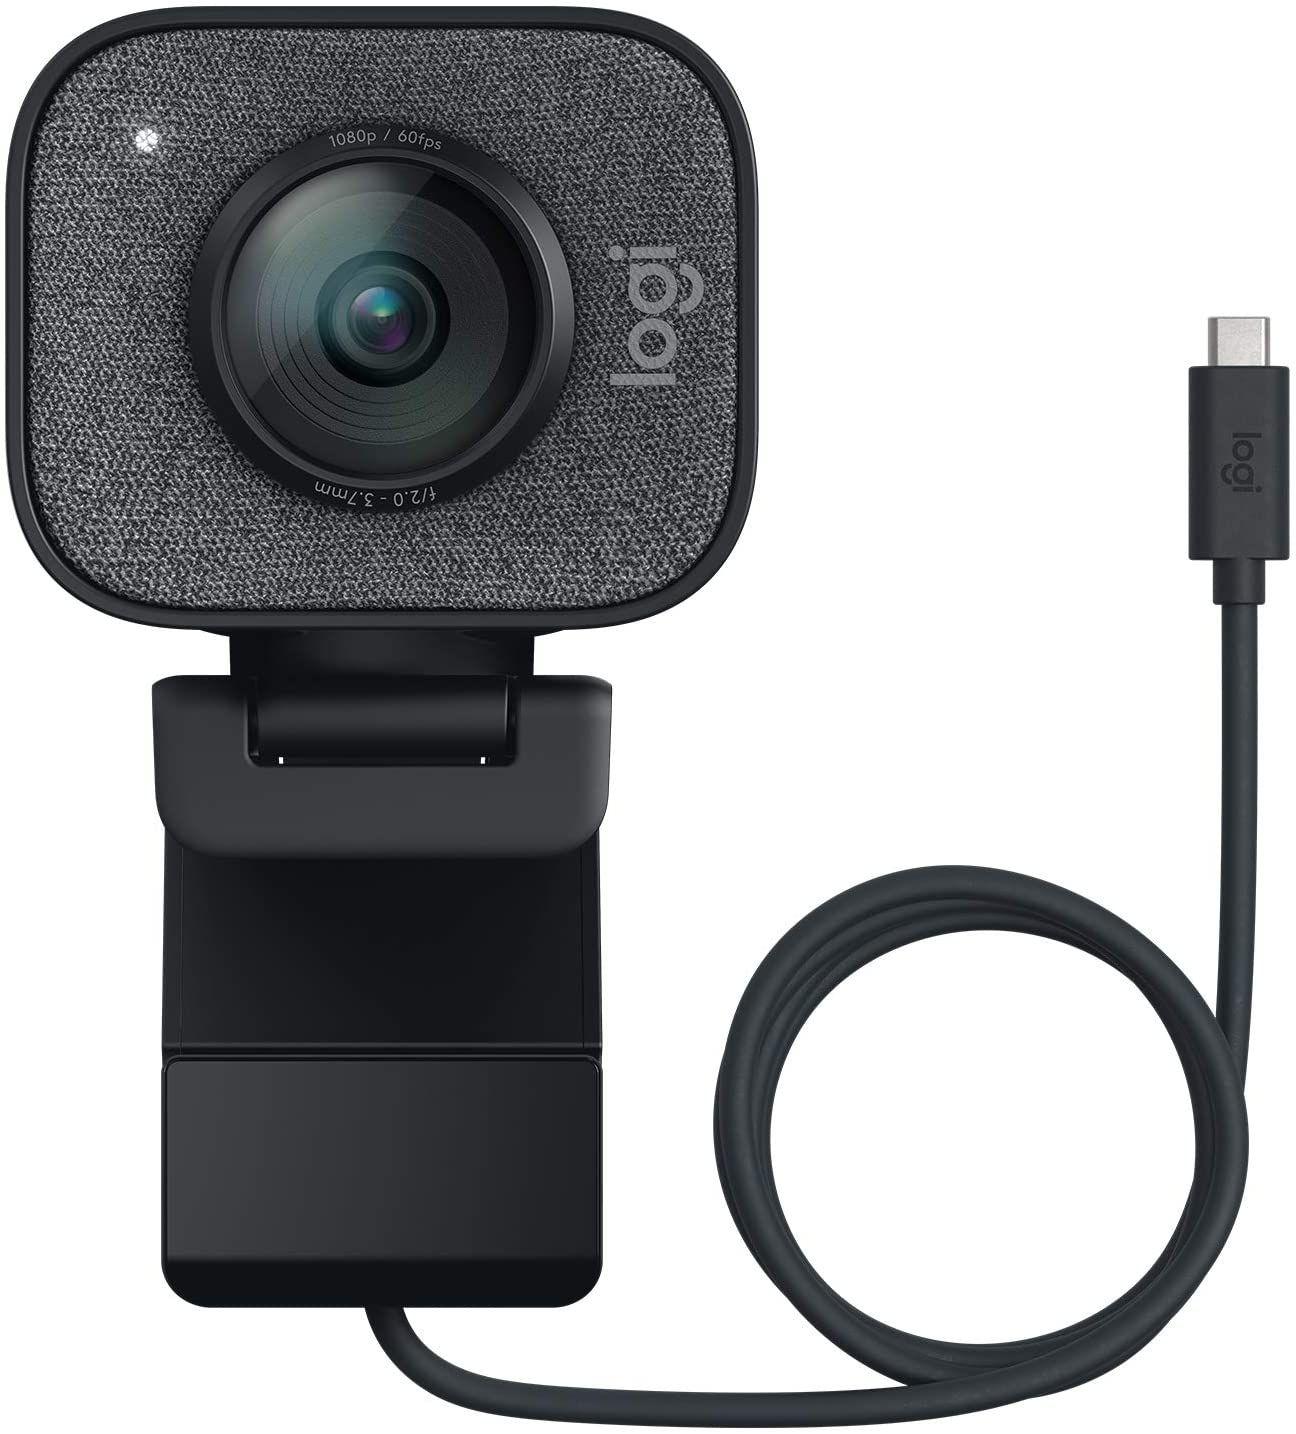 Logitech Streamcam - Full HD Webcam (1080p bei 60 fps, Smart Autofokus & Belichtung, zwei Mikrofone, USB-C, Vertikaler Modus, für PC & Mac)